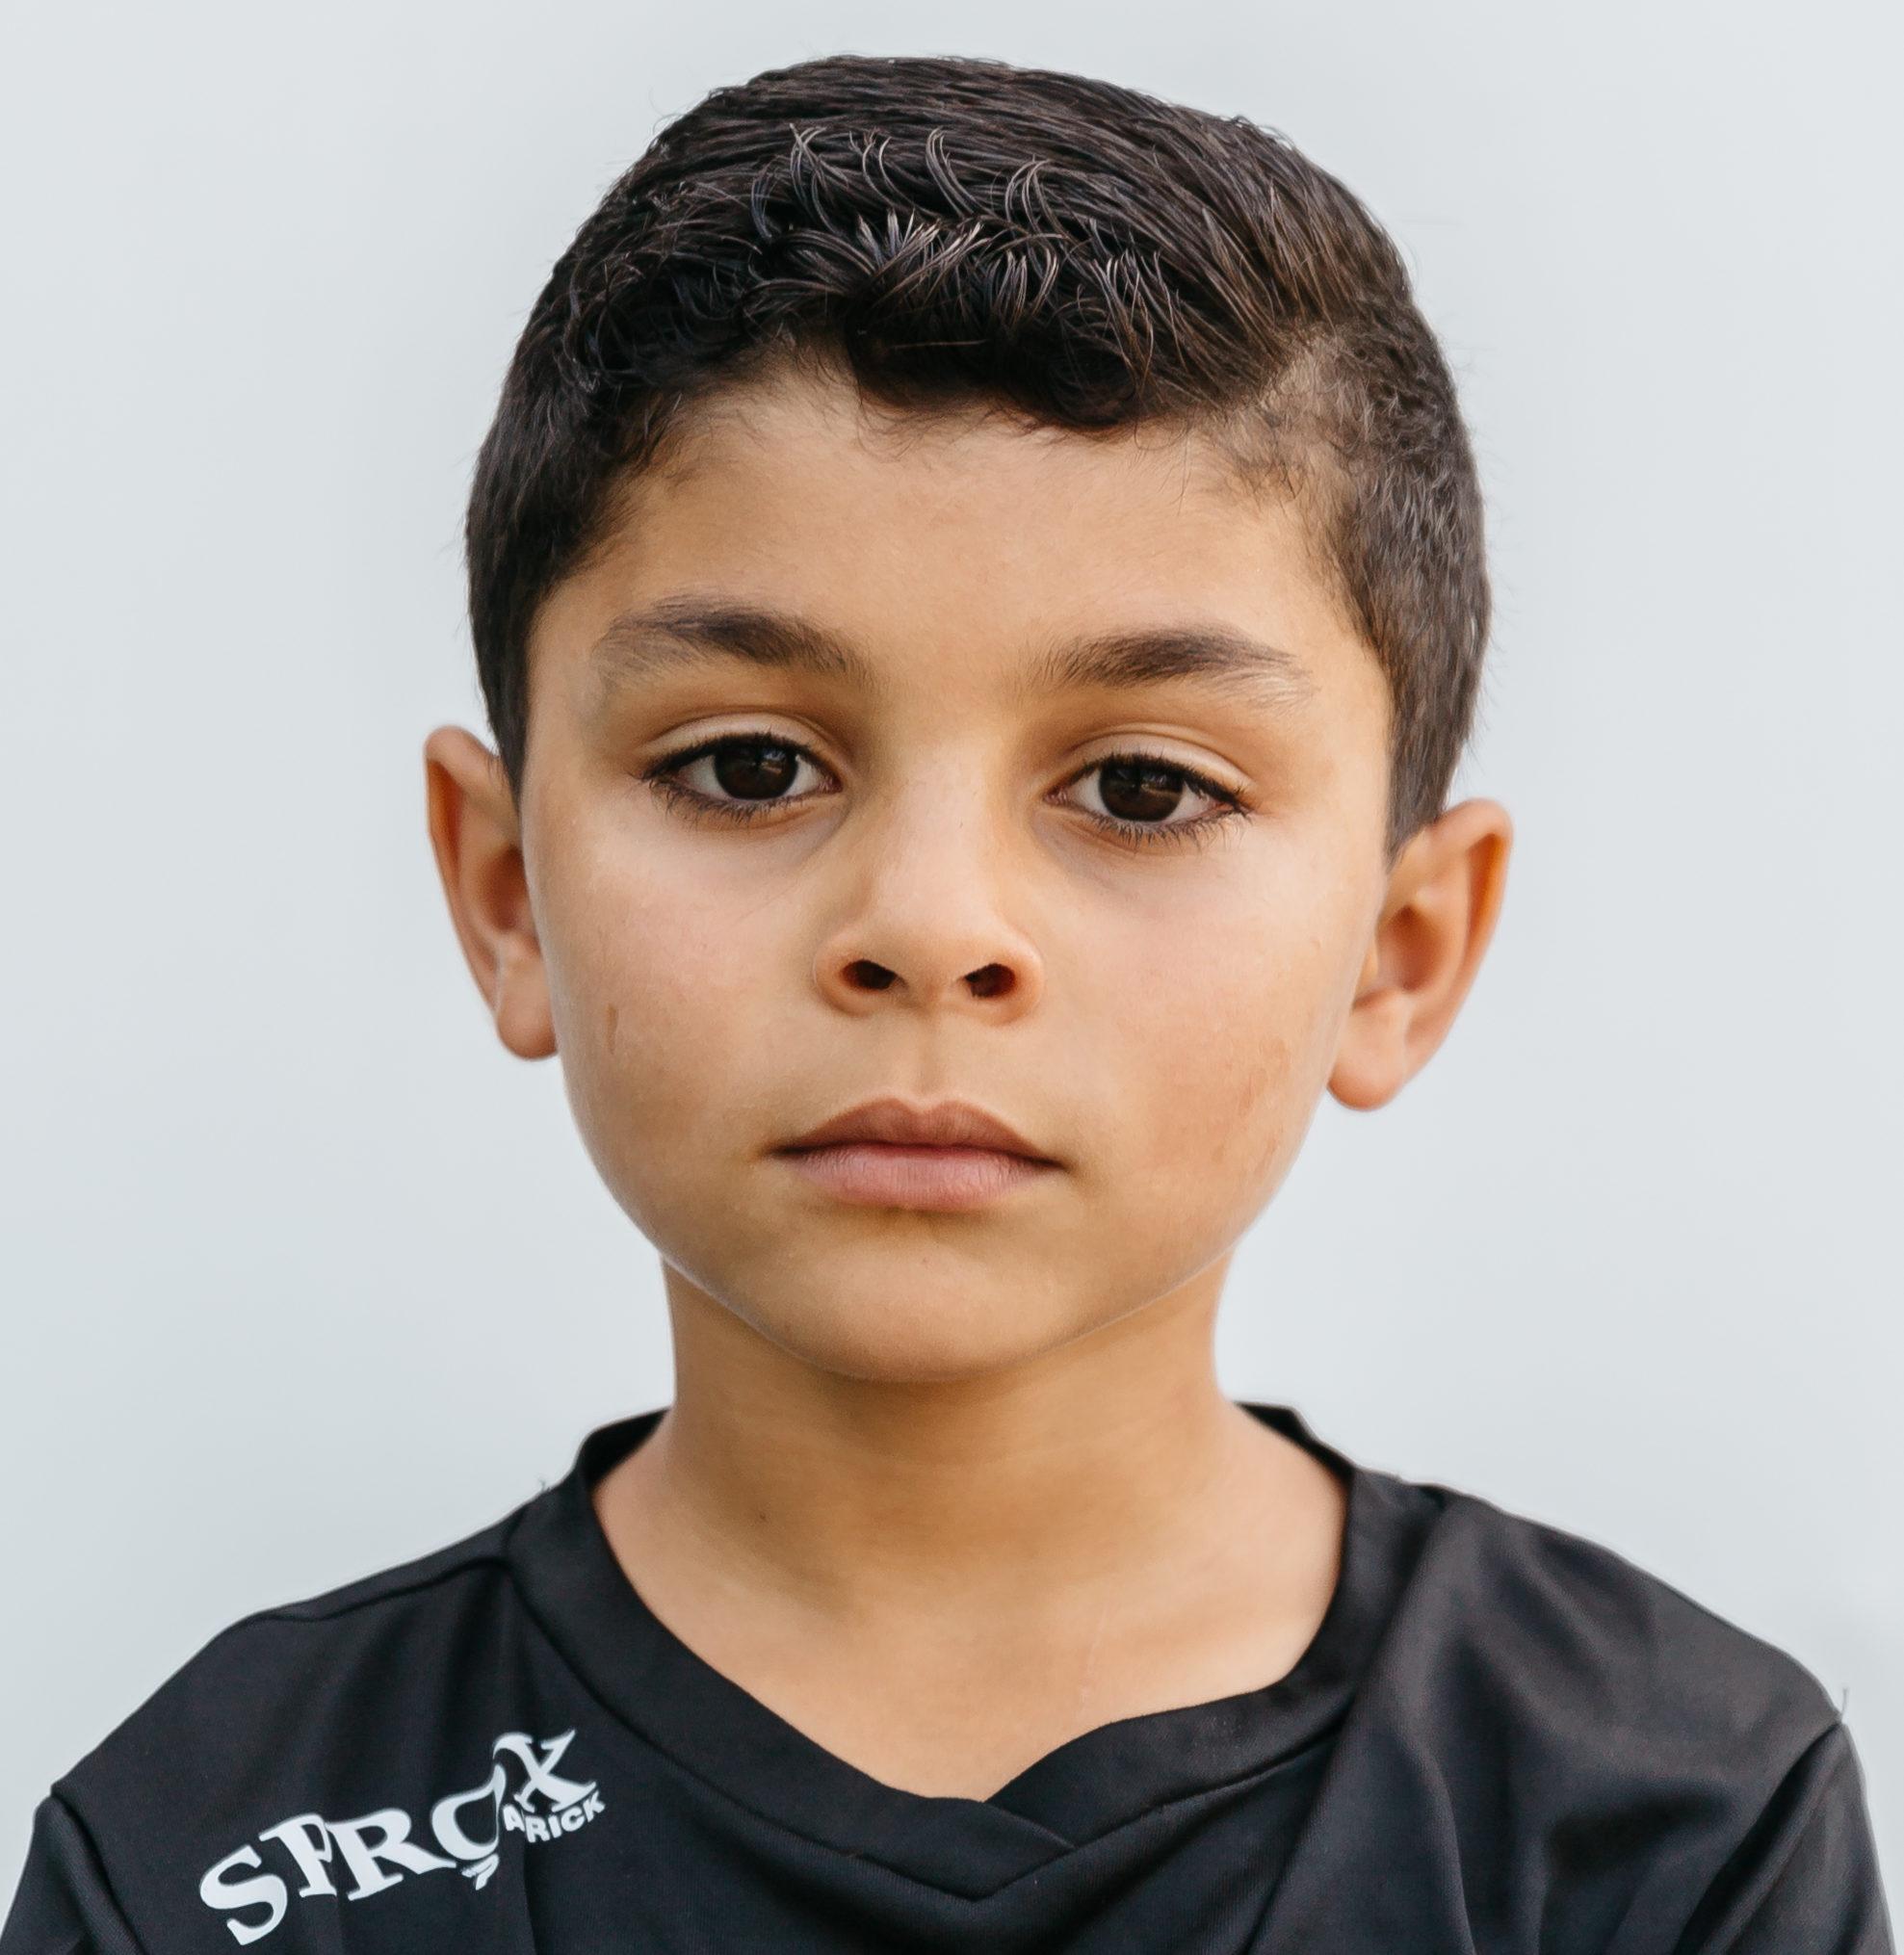 https://socceracademybreda.nl/wp-content/uploads/2017/05/SAB-Mehdi-1-e1568185463658.jpg